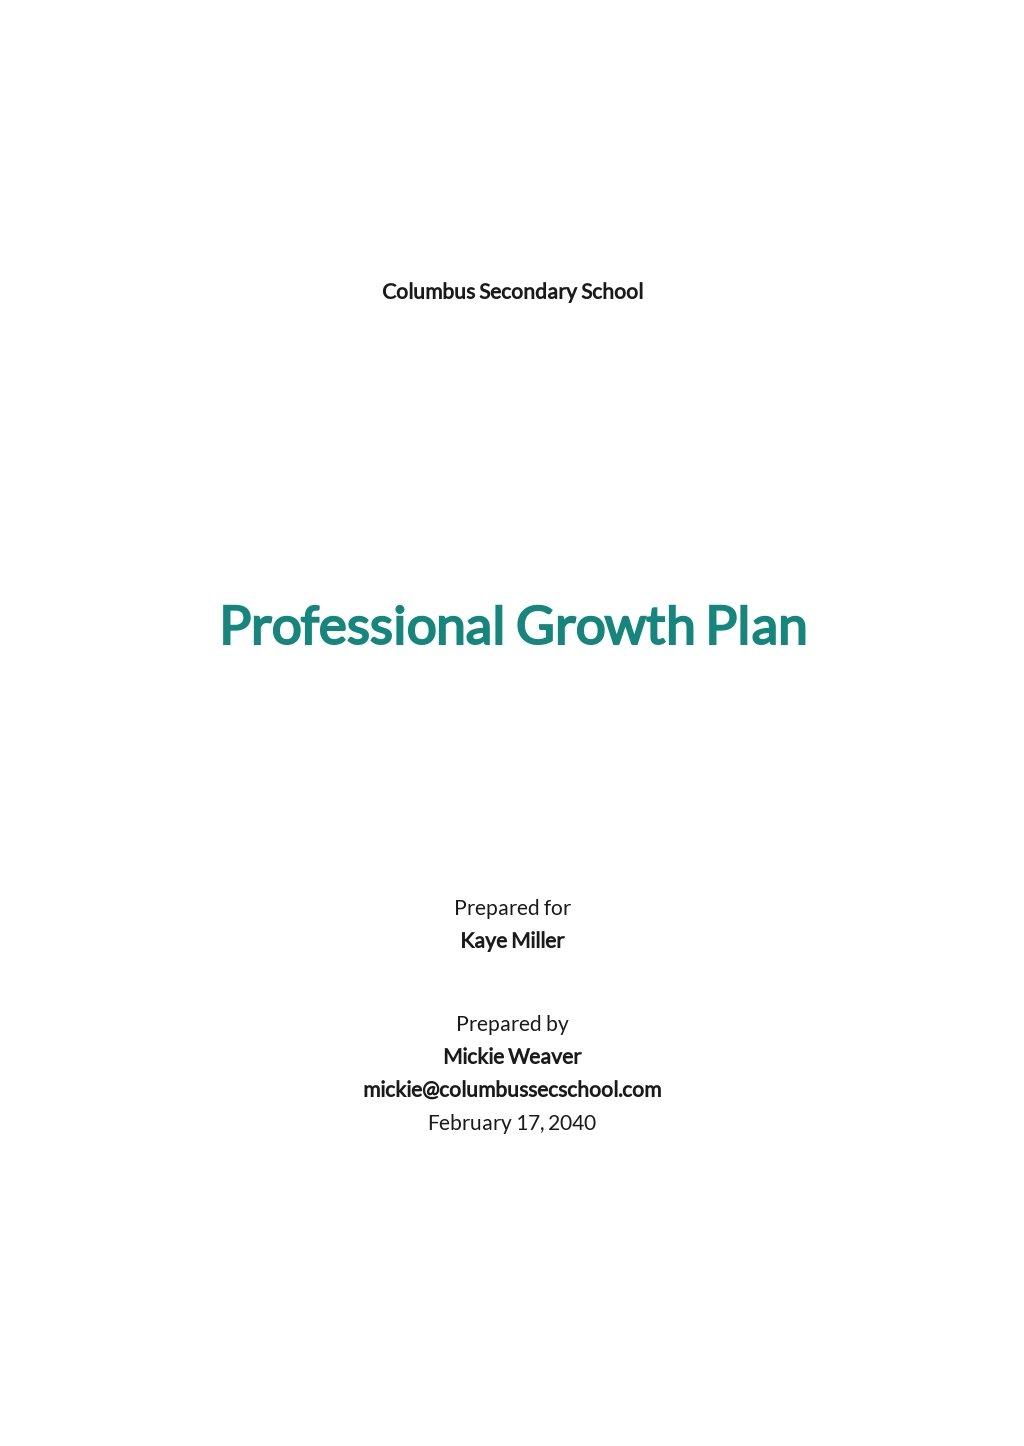 Professional Growth Plan Template.jpe